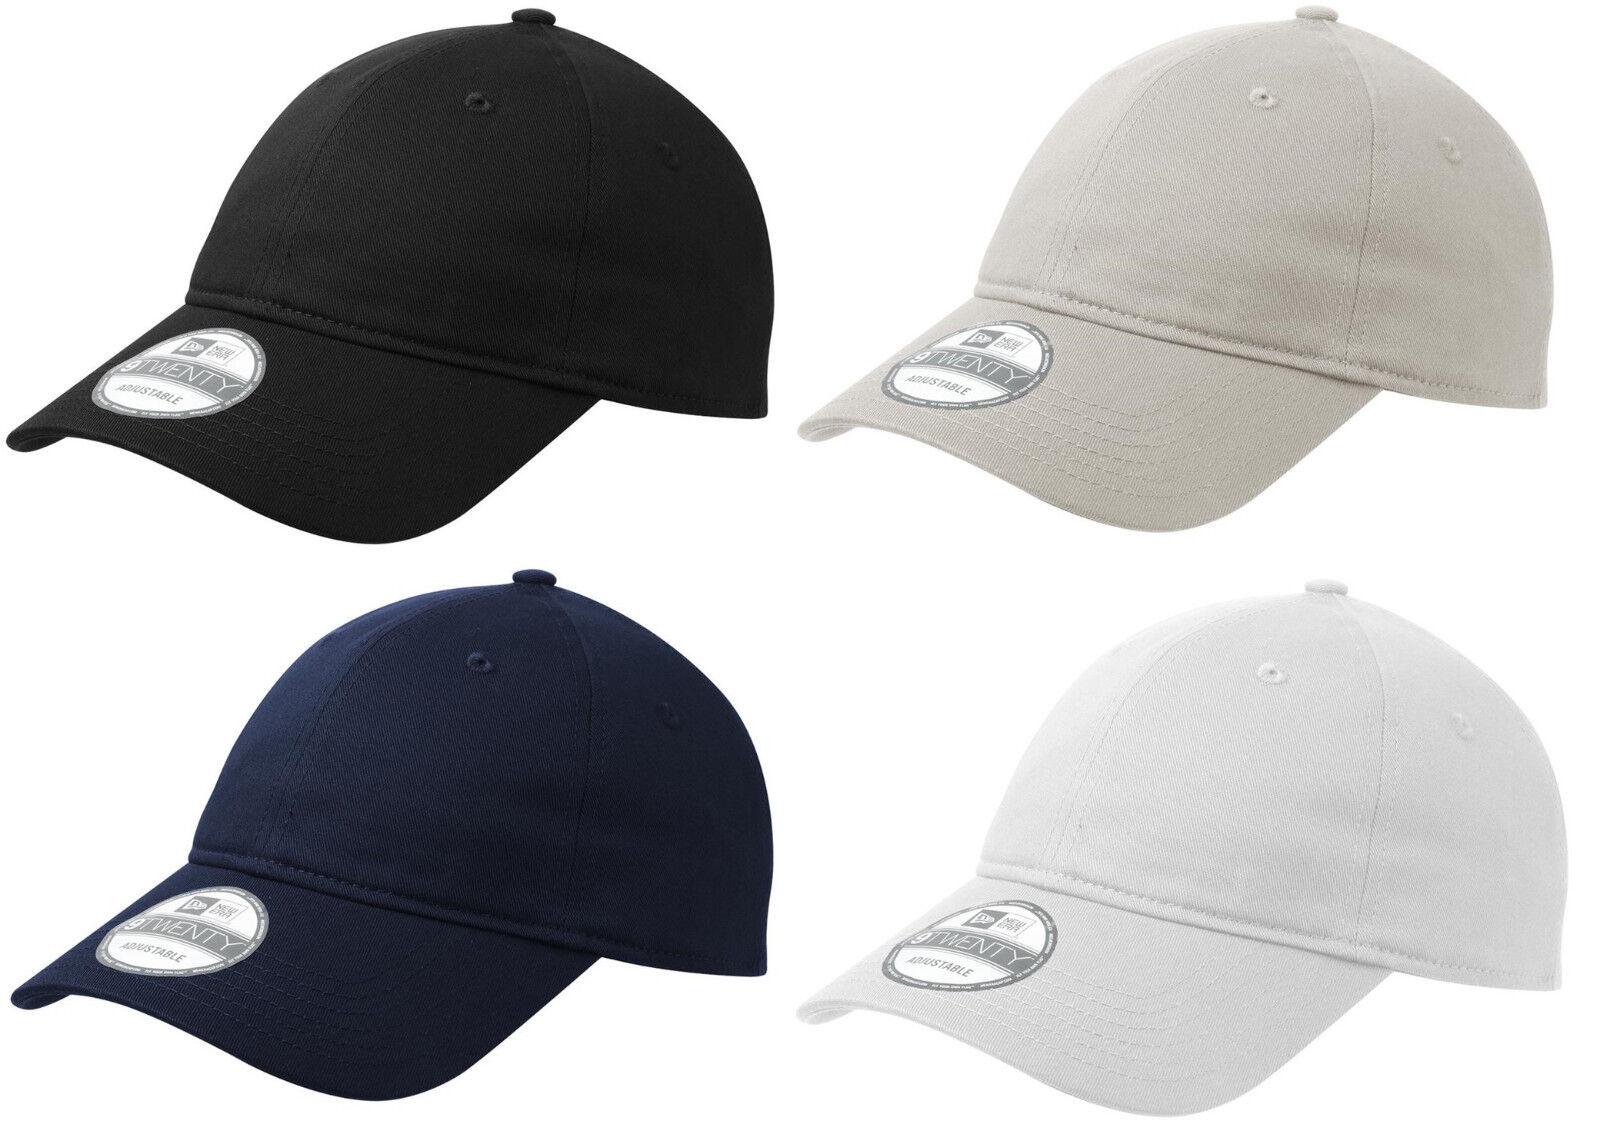 New Era 9TWENTY Adjustable - Strapback Hat Dad Cap - Adjustable Blank -Black Navy White 920 70edd4